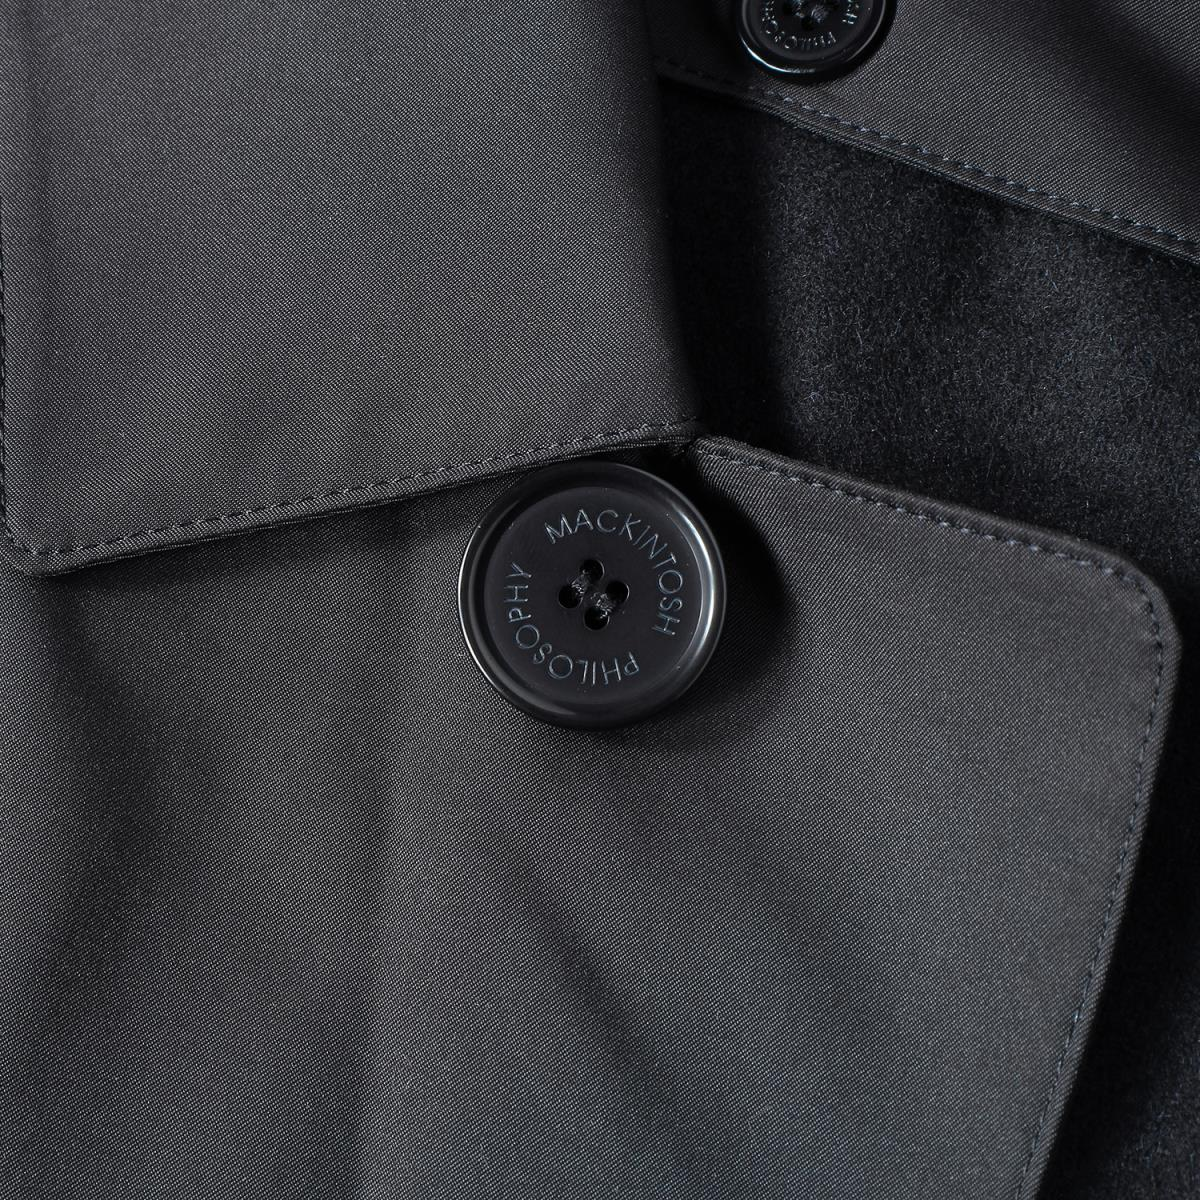 MACKINTOSHマッキントッシュコート 中綿ライナー 付き ポリエステル ステンカラーコート MACKINTOSHrtshQxdC